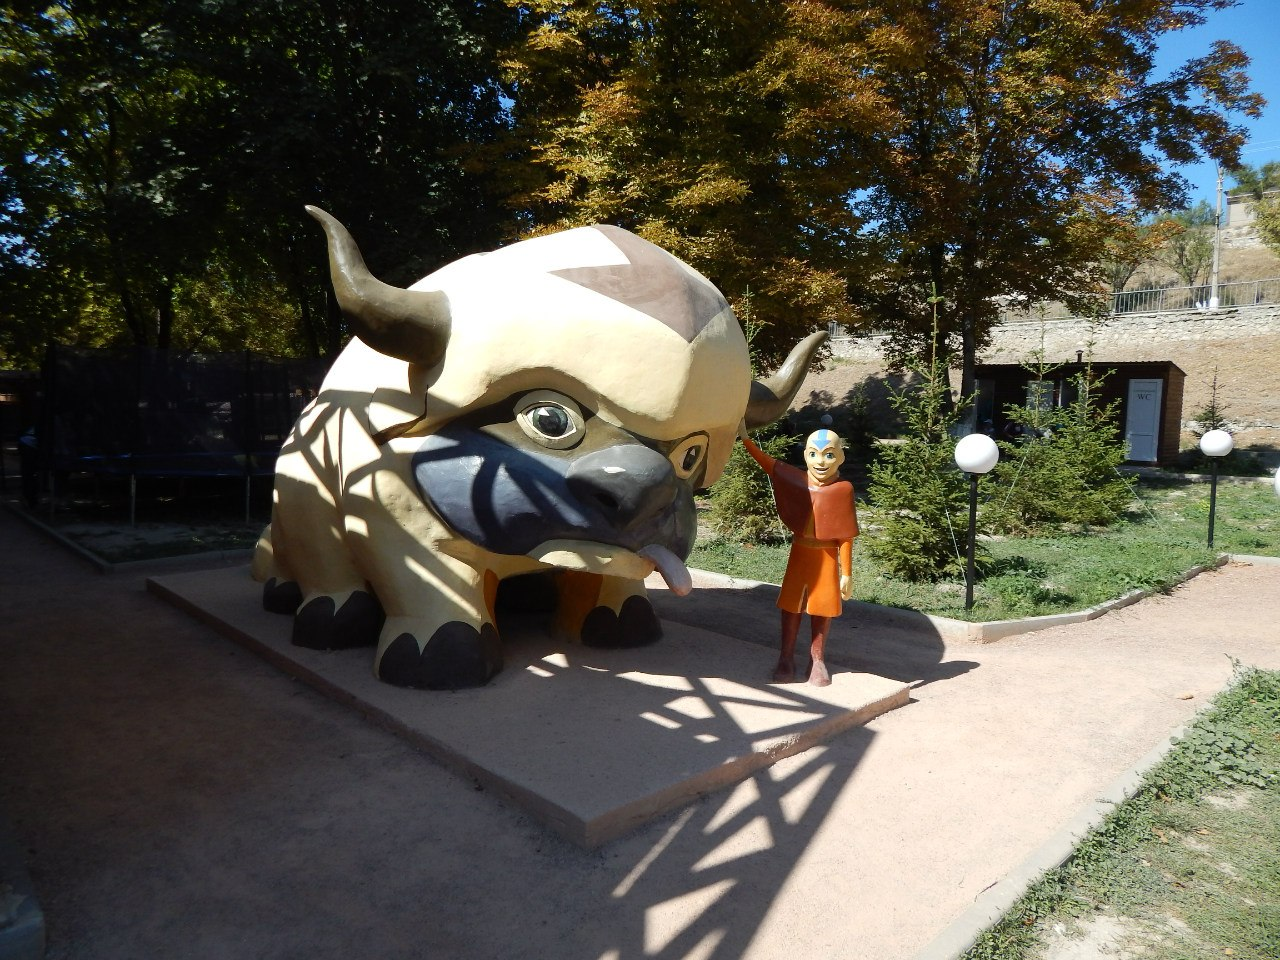 Аанг аватар в парке миниатюр в Евпатории